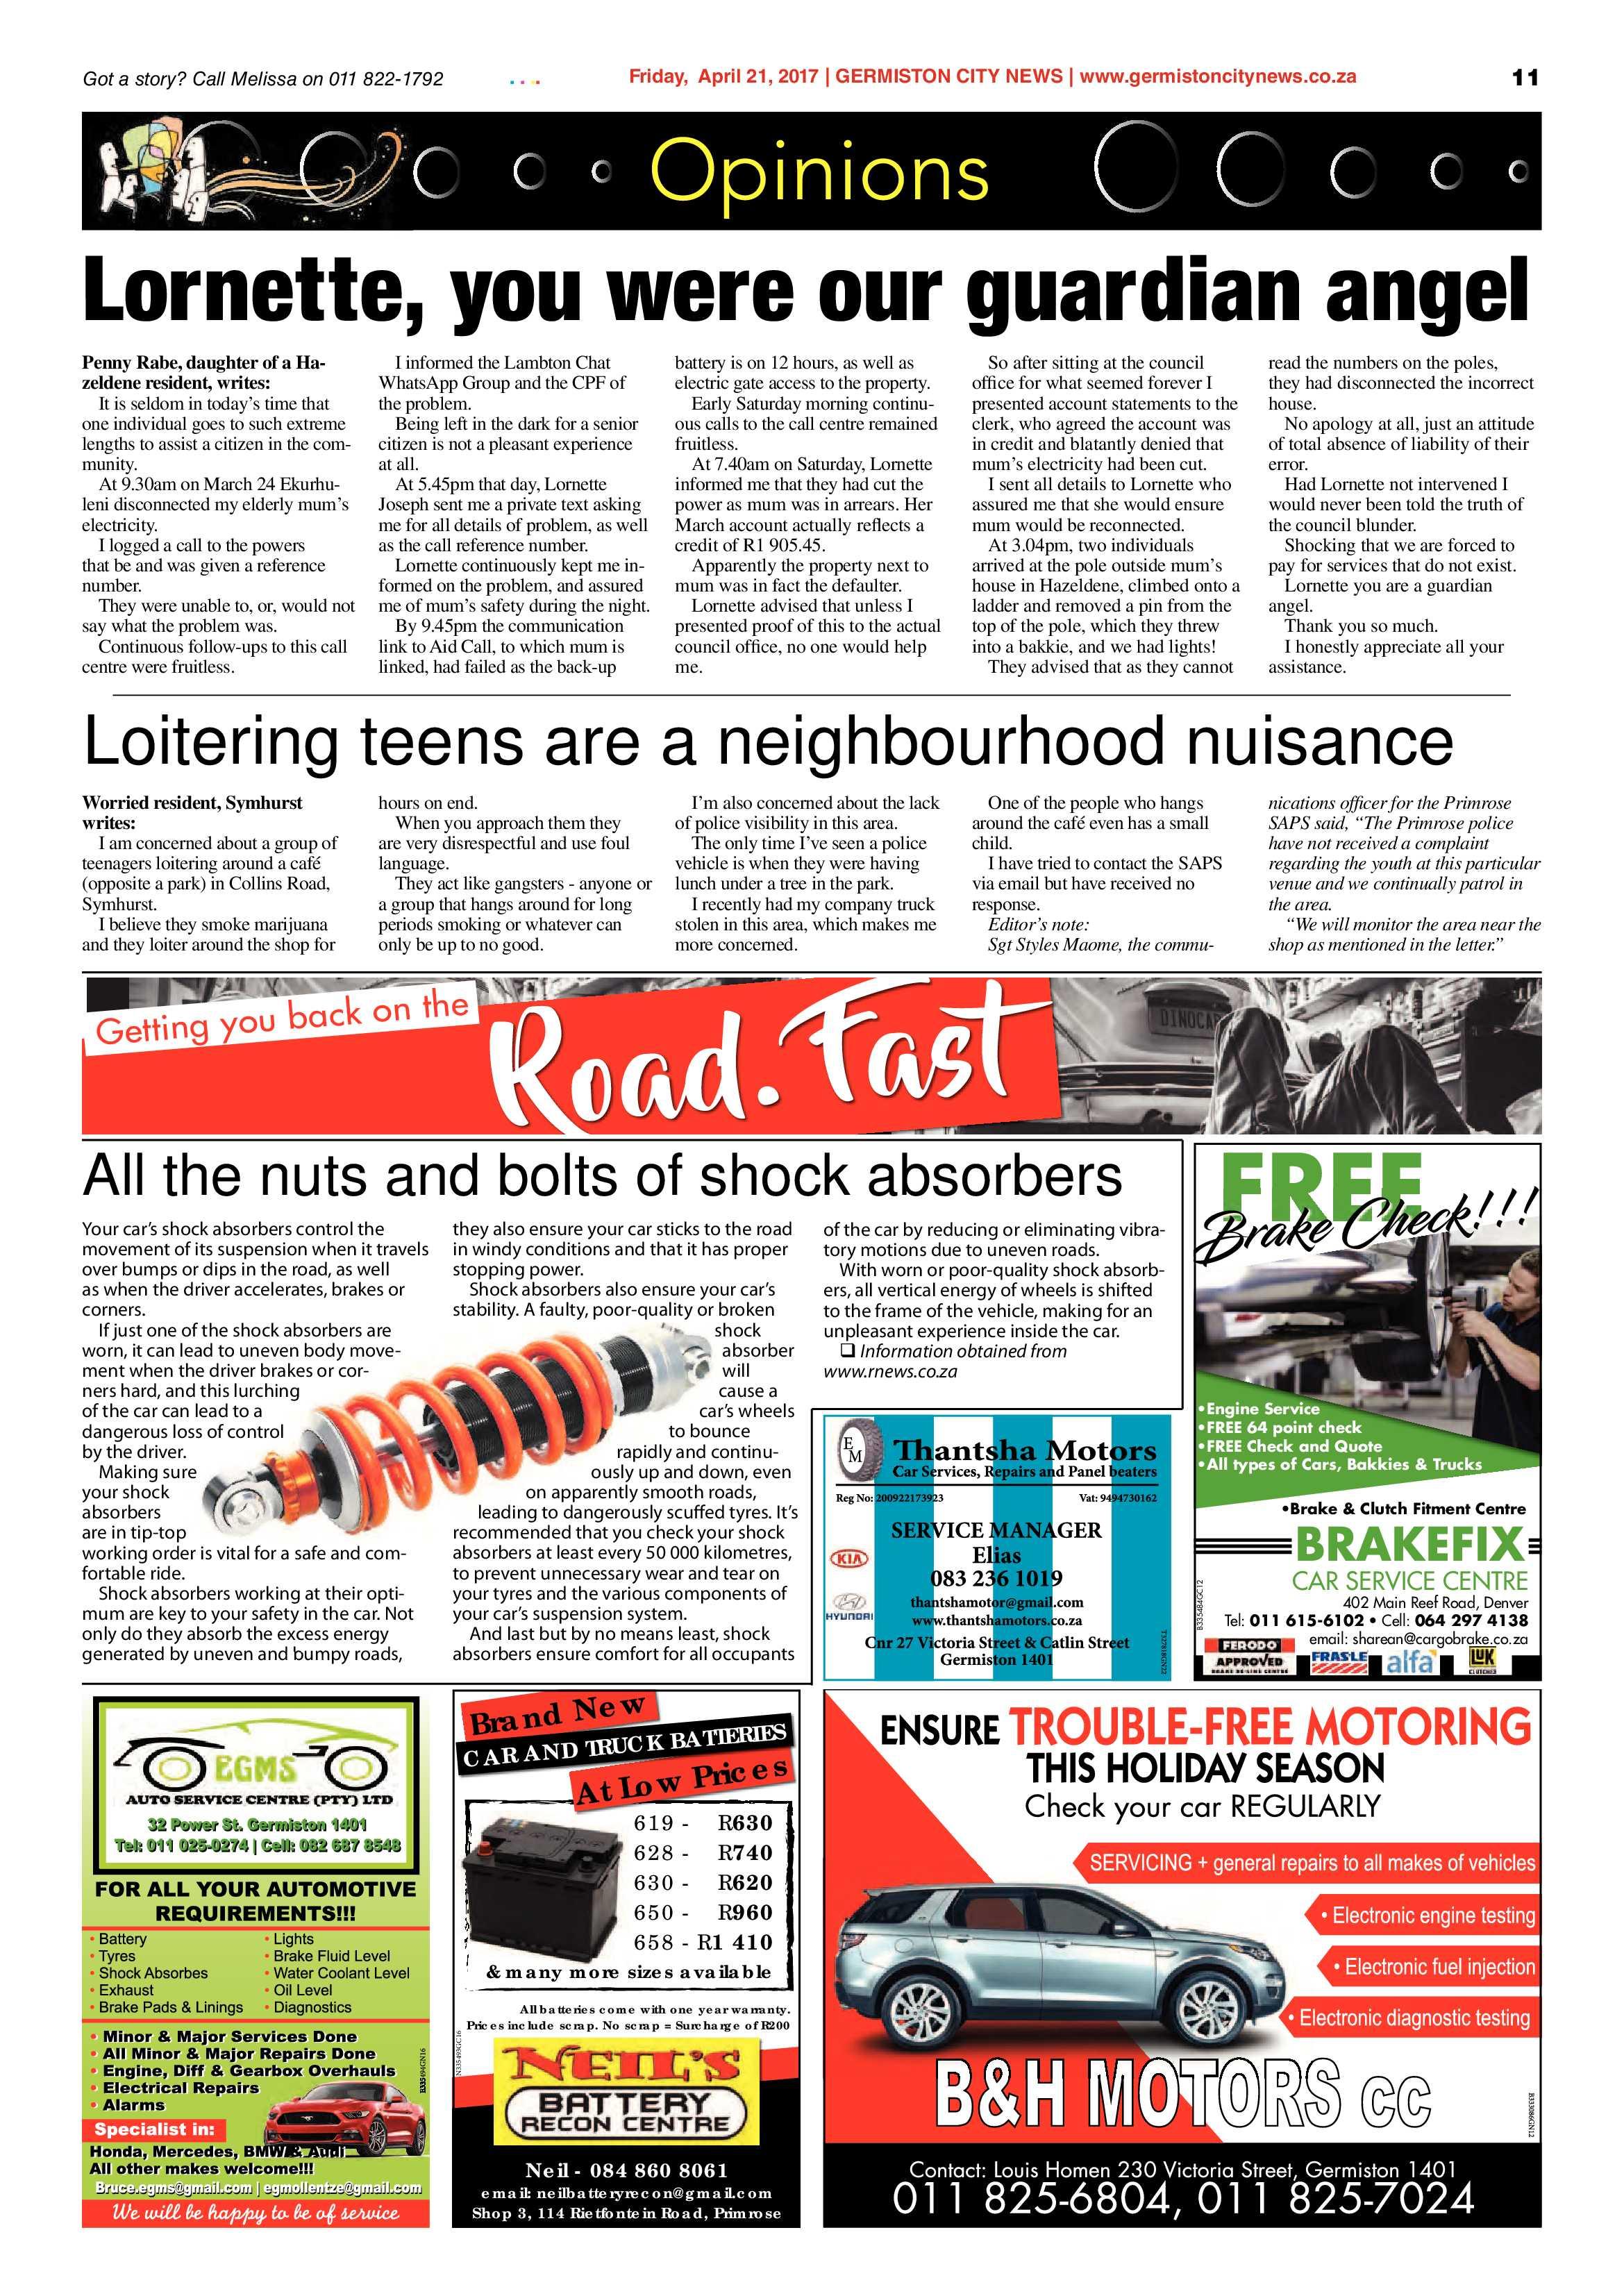 germiston-city-news-19-april-2017-epapers-page-11